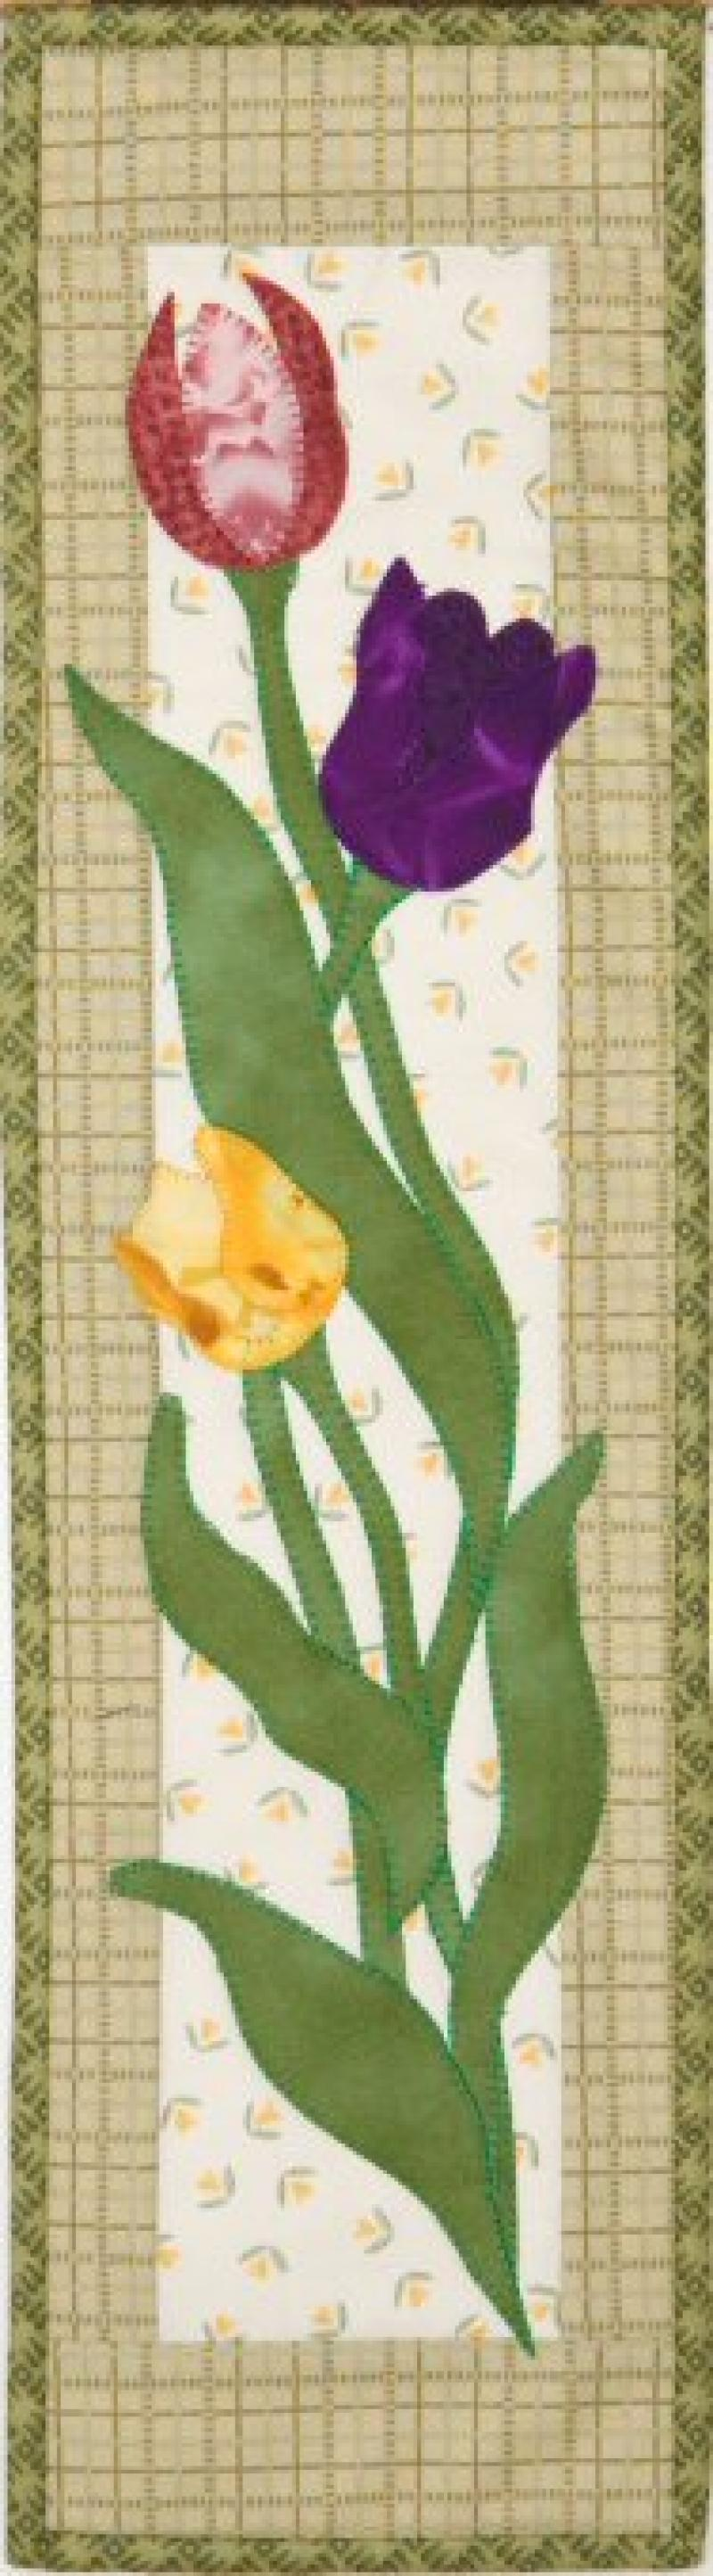 MM305 Tulips